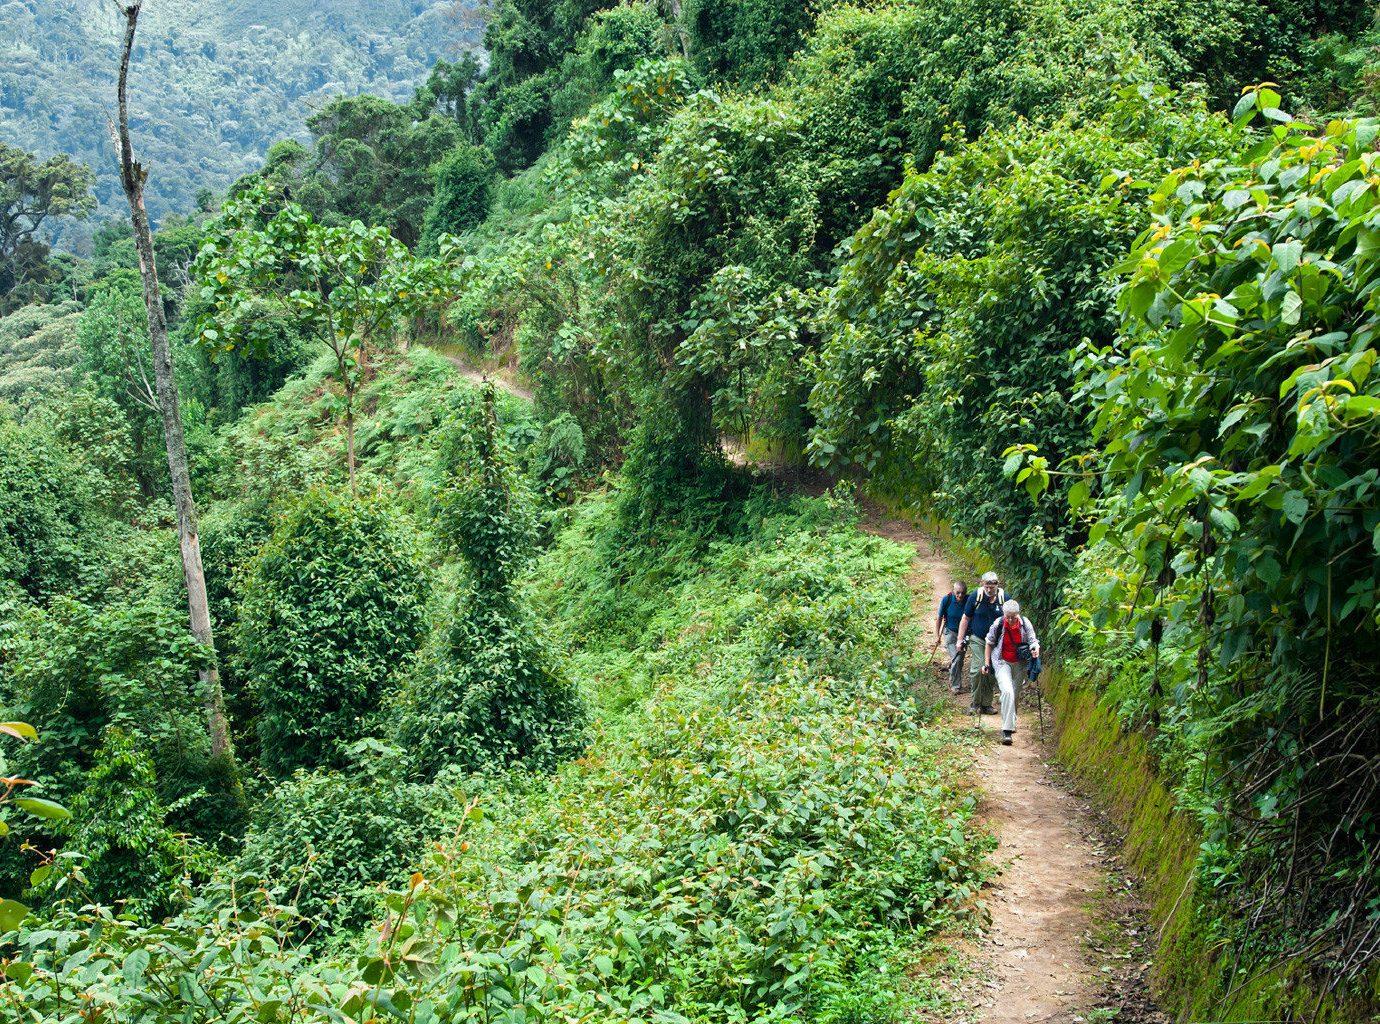 Rain Forest In Costa Rica